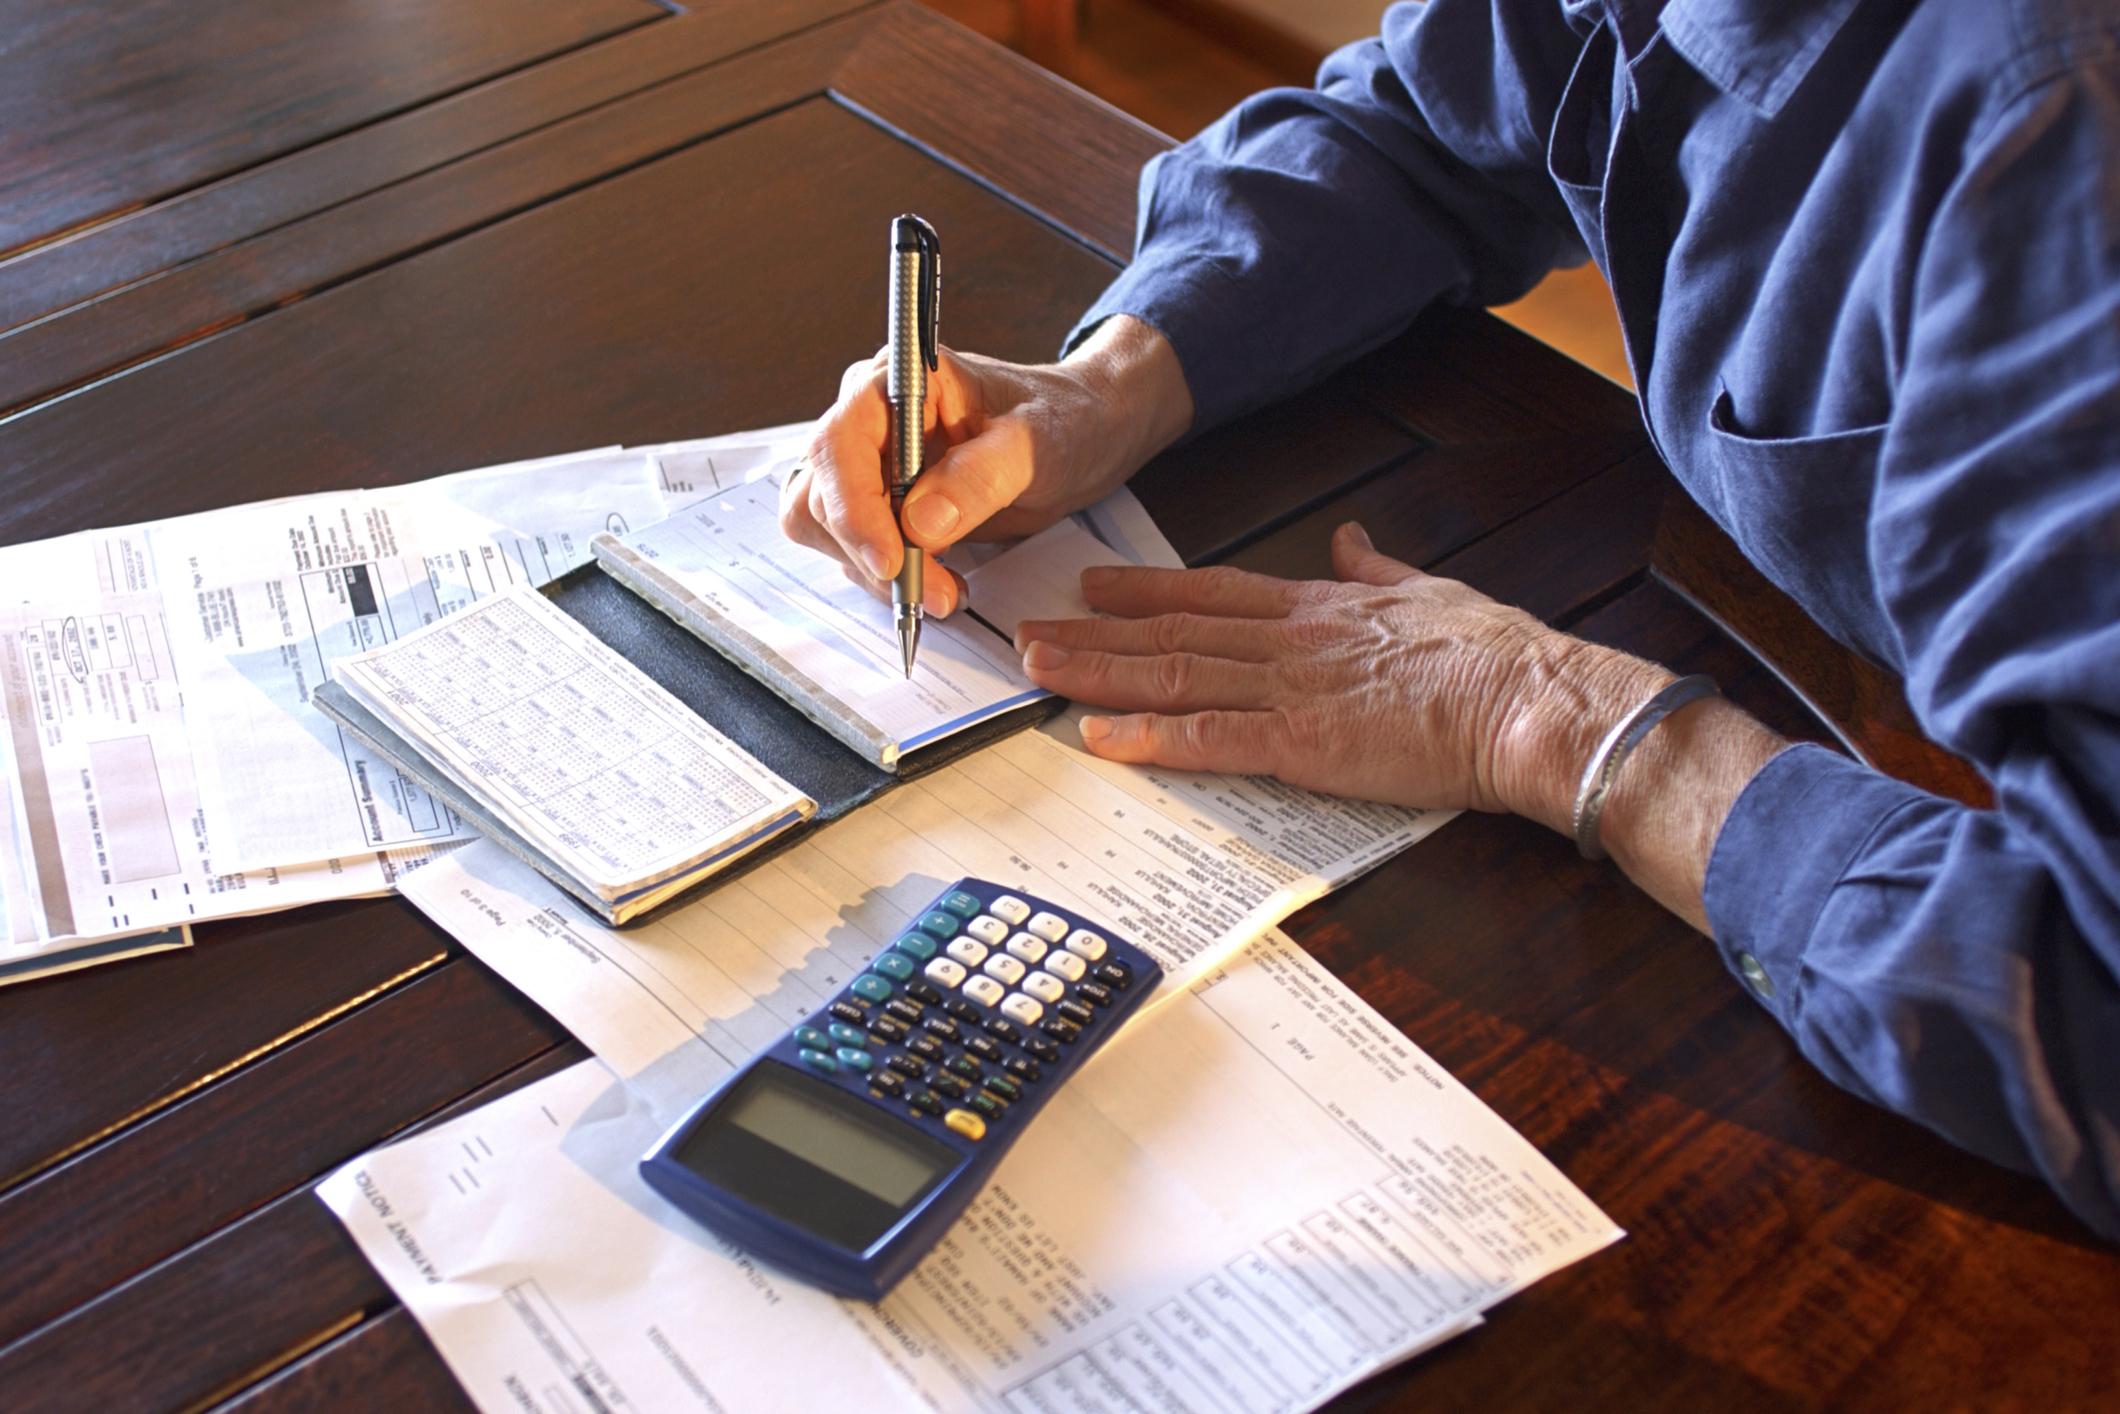 Social Security Error Jeopardizes Medicare Coverage For 250,000 Seniors